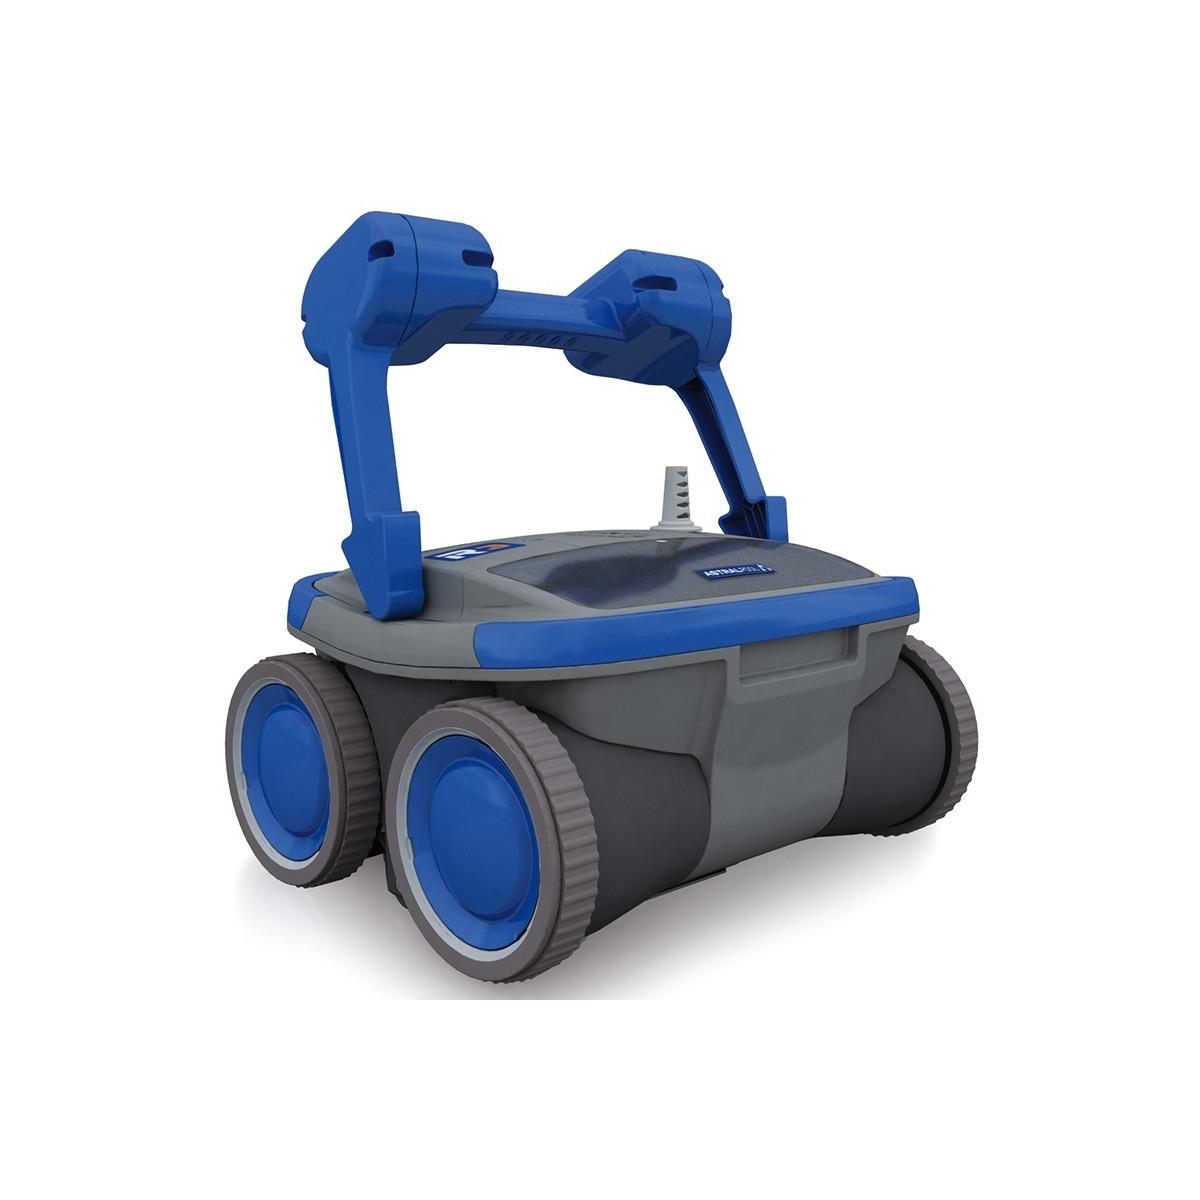 Robot limpiafondos R3 para suelo